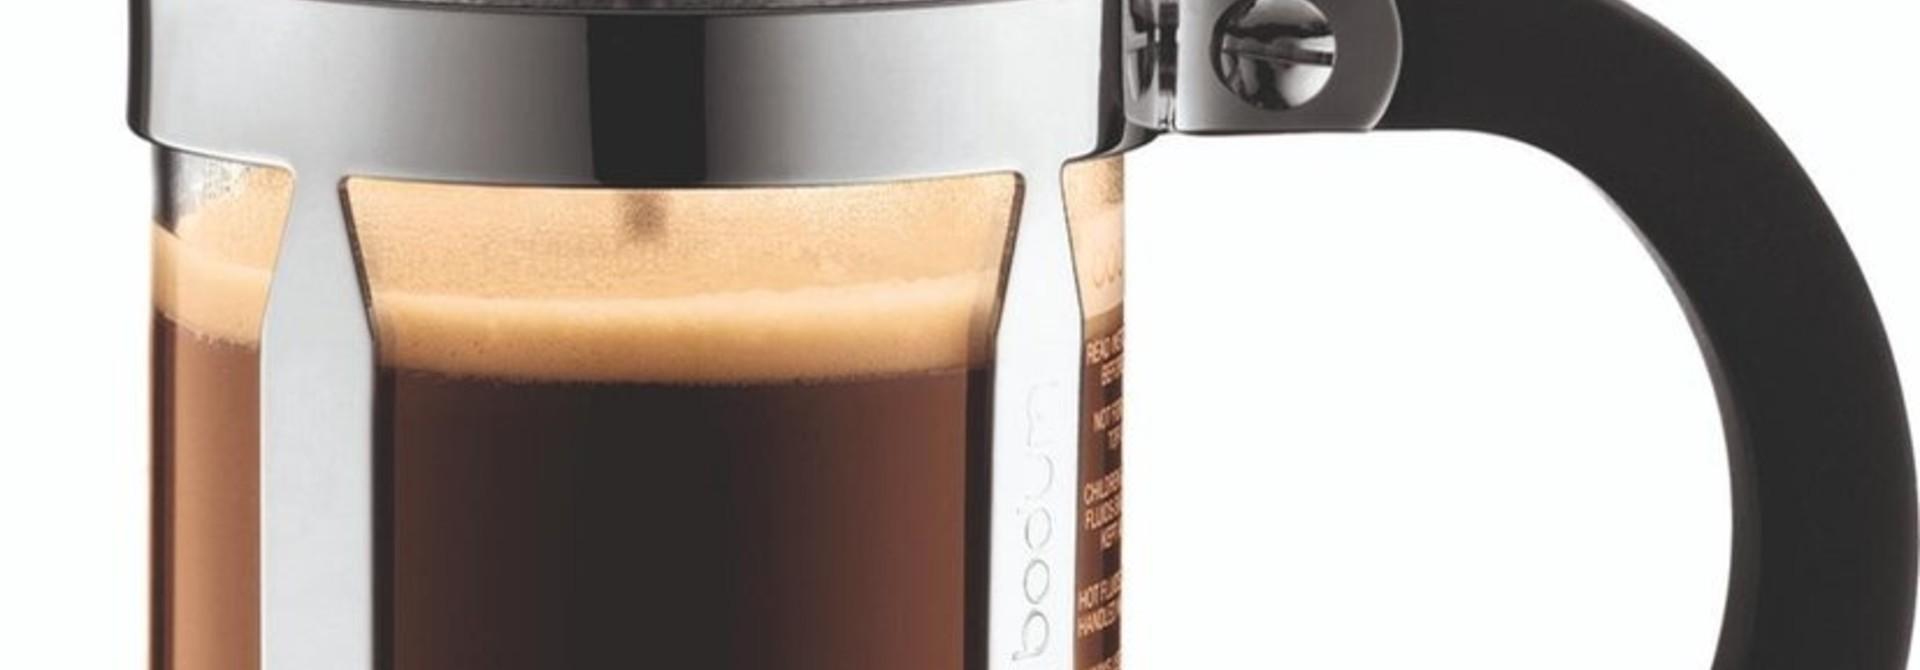 Bodum Chambord French Press Cafetière - Borocilicate glas - 0.35 l - 3 kops